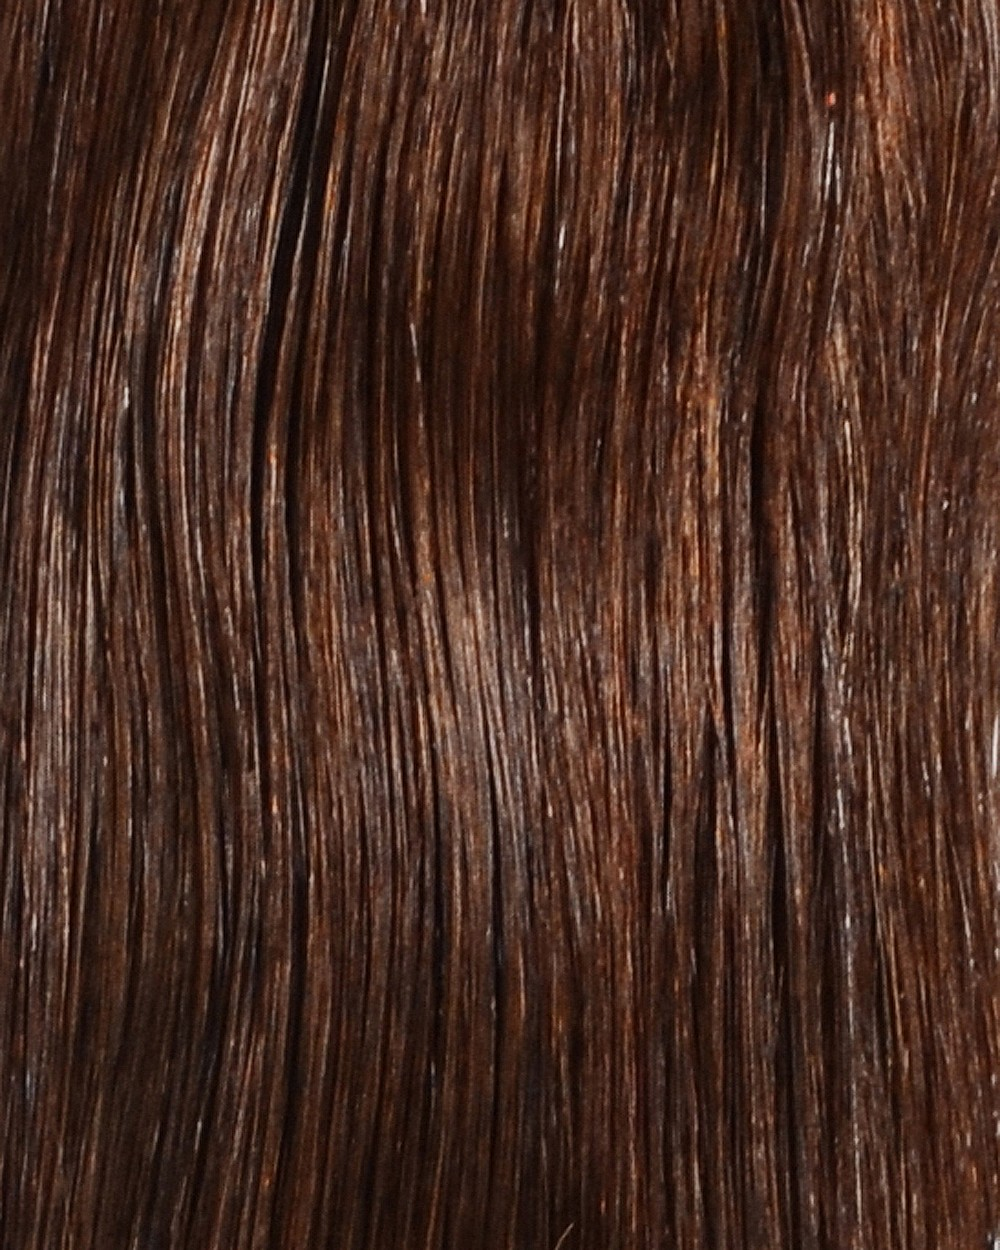 Medium Brown (3)